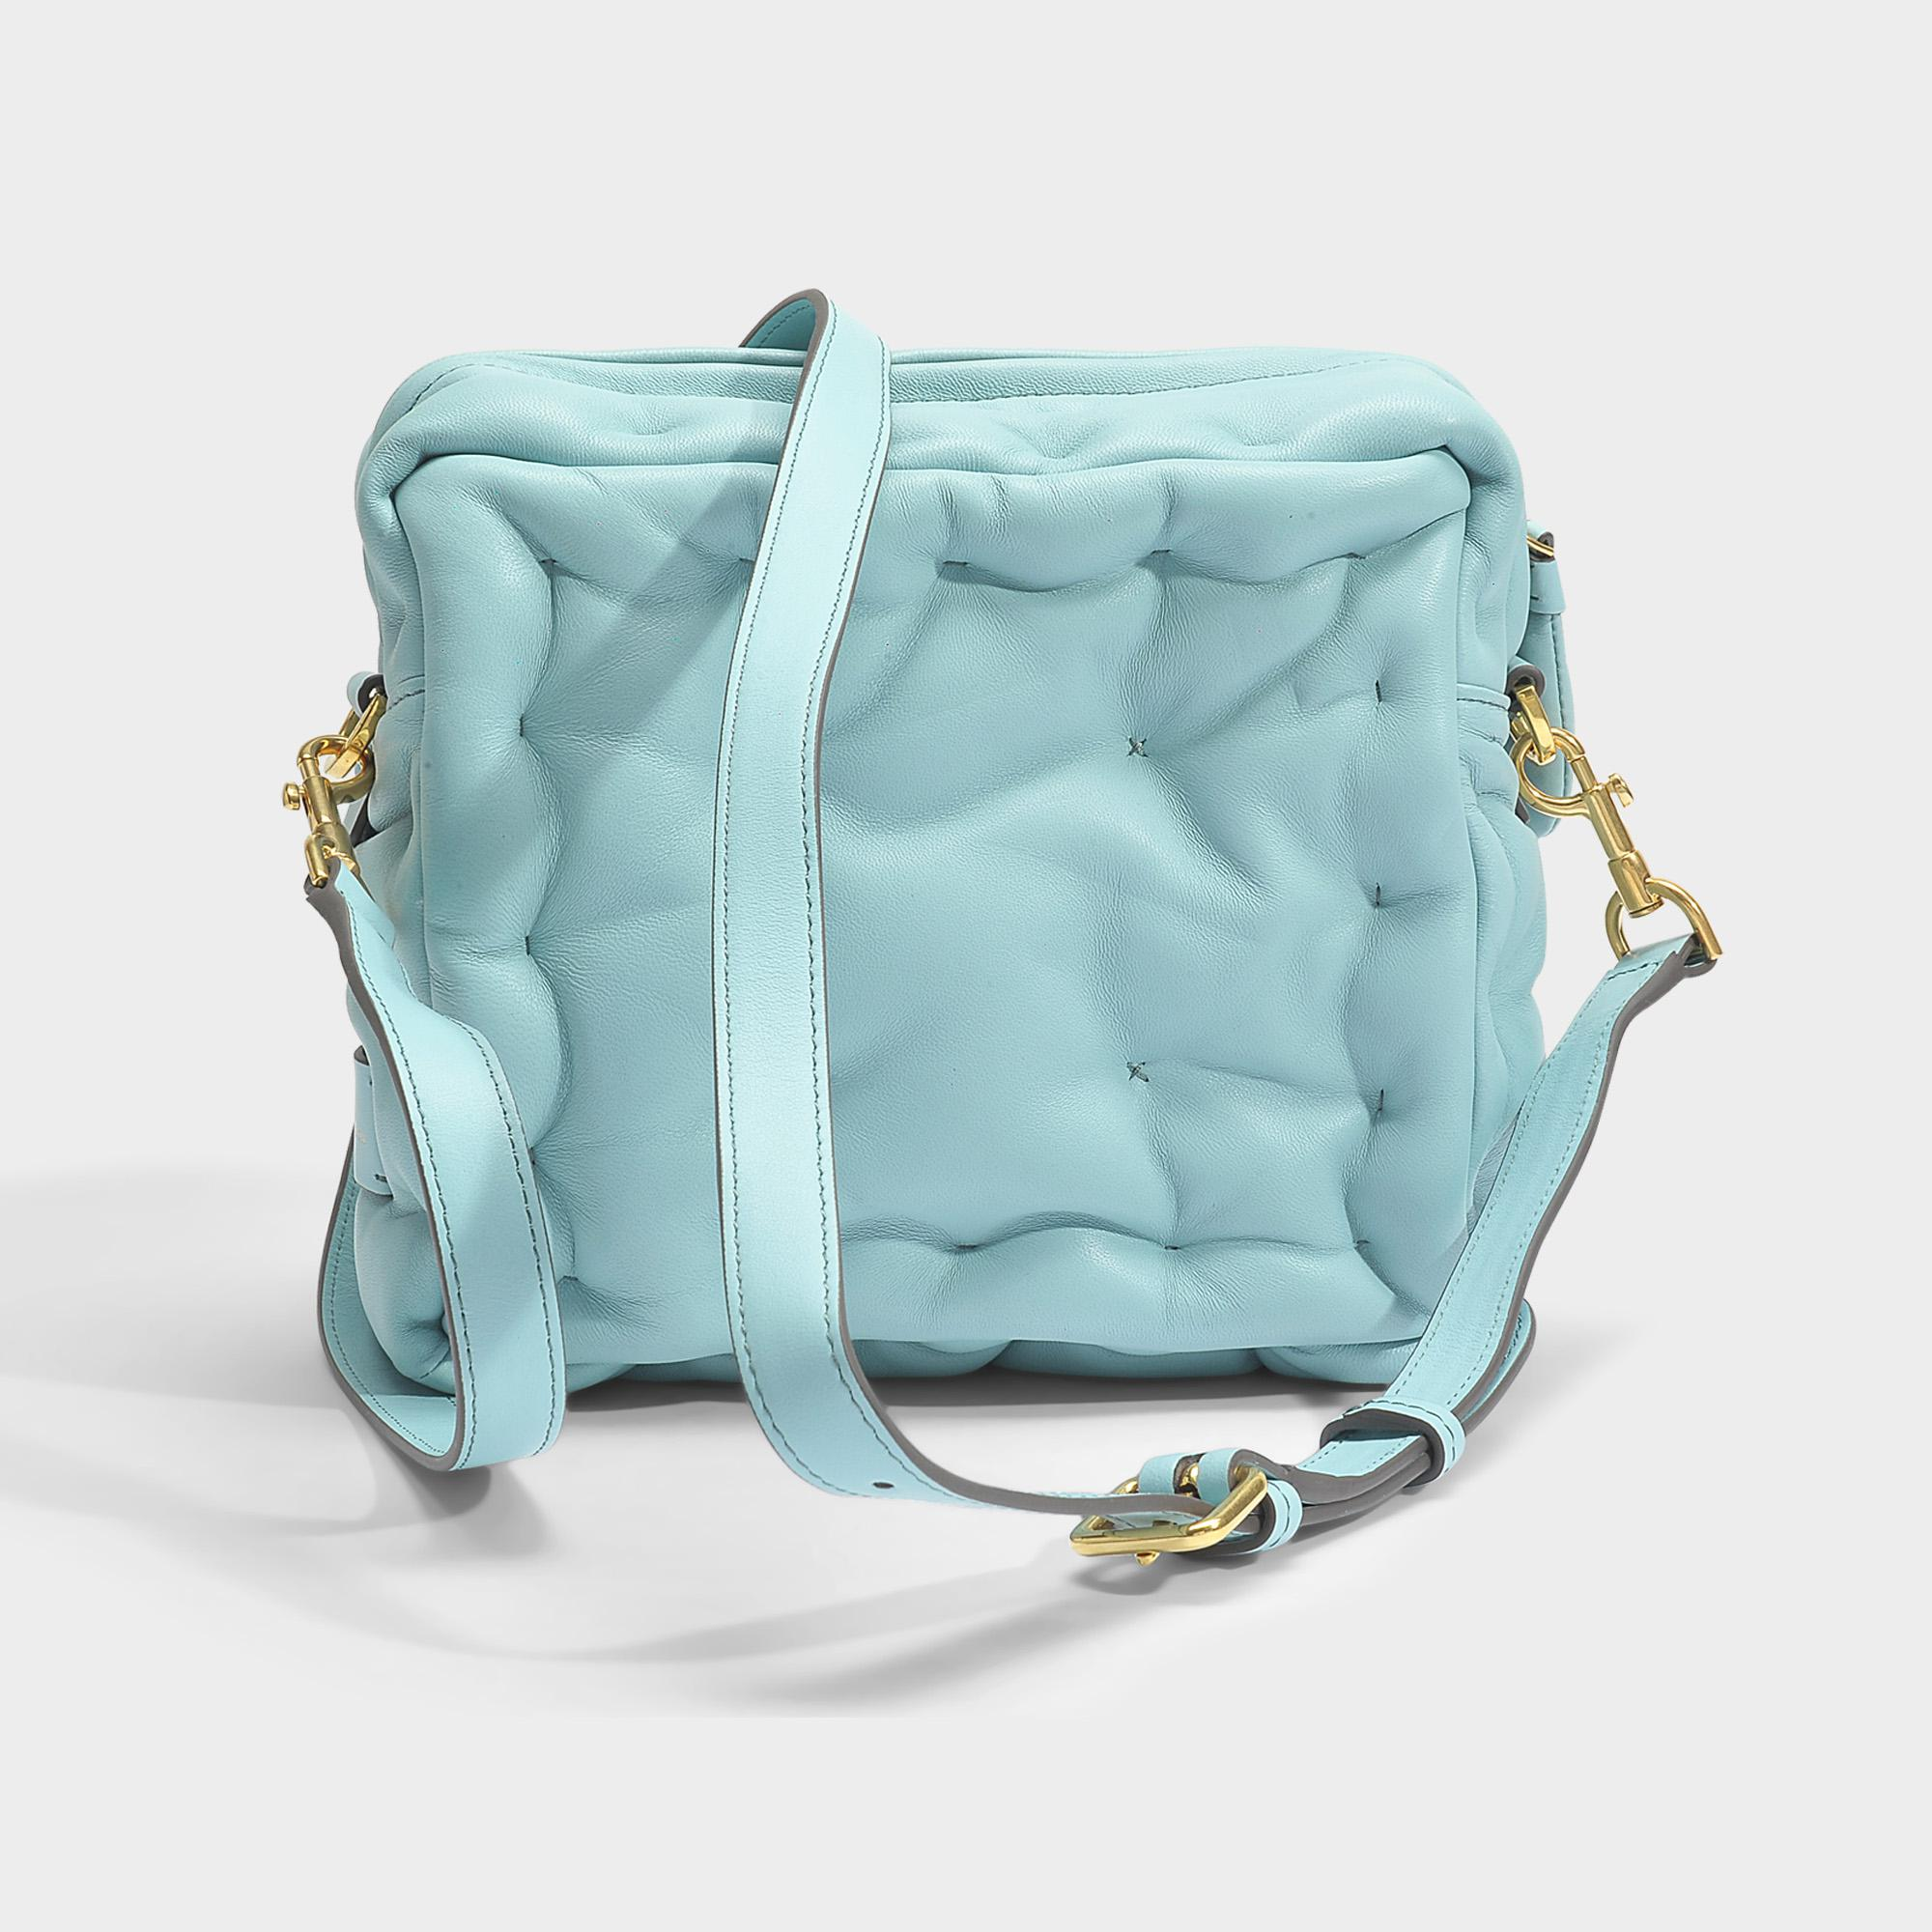 Anya Hindmarch Chubby Cube Crossbody Bag in Green